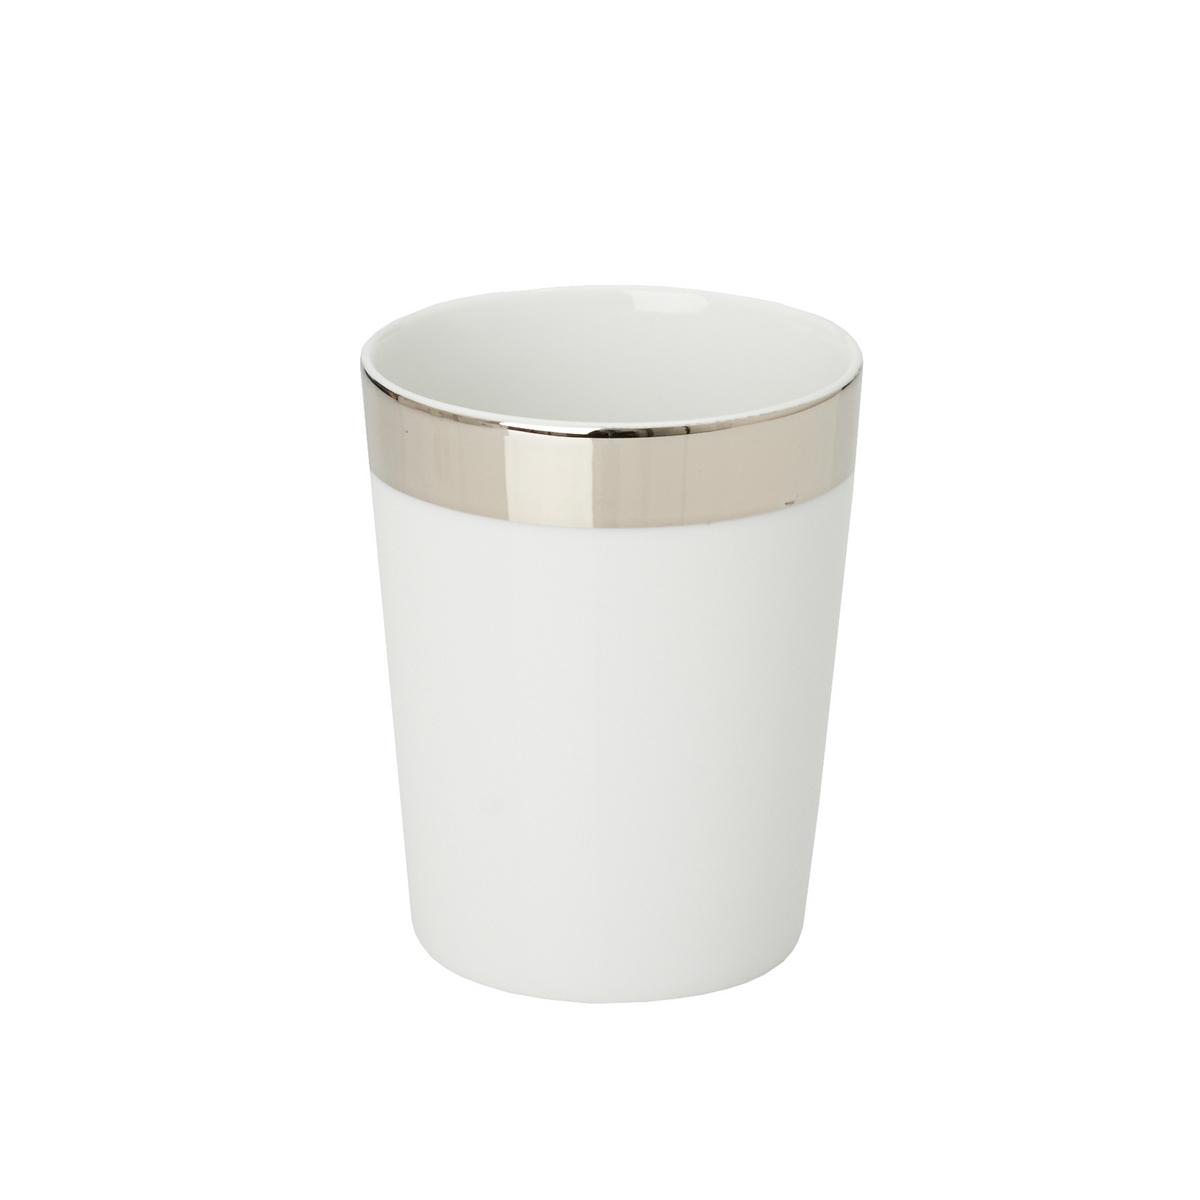 Decor walther porcelain bathroom tumbler platinum for Bathroom tumbler